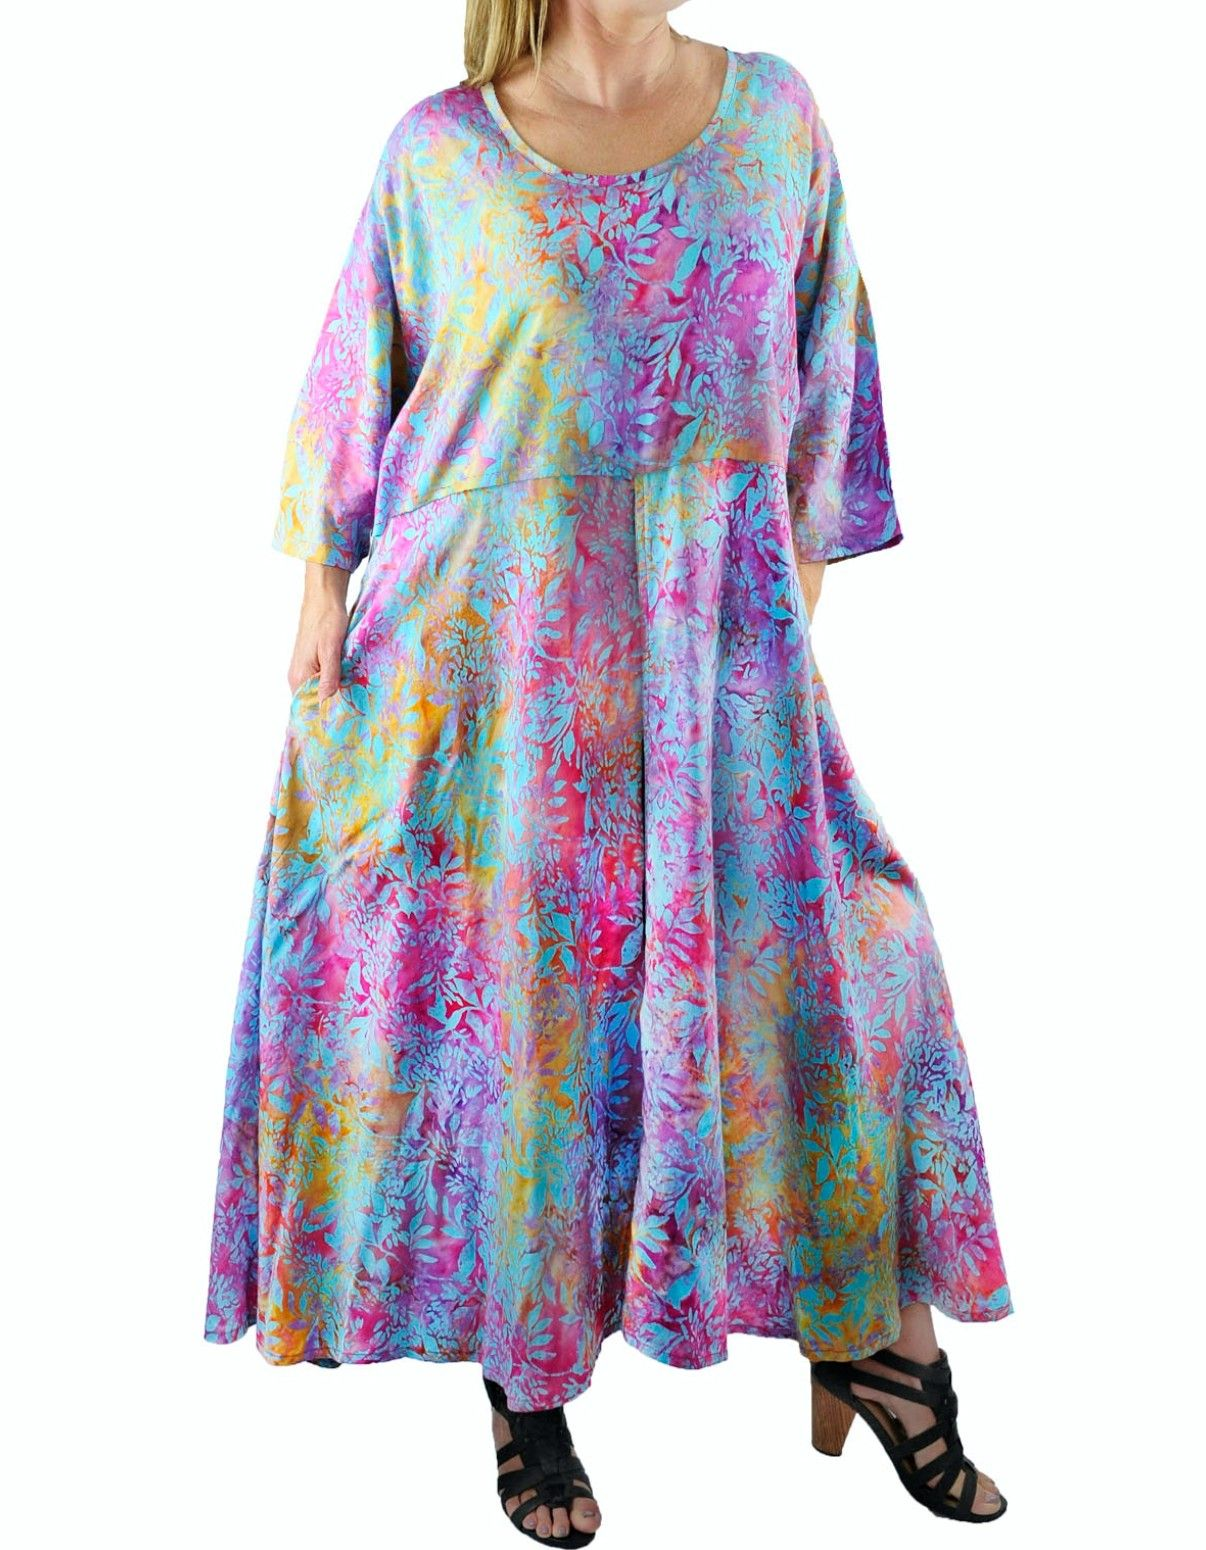 Women S Plus Size Maxi Dress Dancing Sage Delia With Pockets L Xl 0x 1x 2x 3x 4x 5x 6x Plus Size Maxi Dresses Dresses Delias Dresses [ 1550 x 1206 Pixel ]